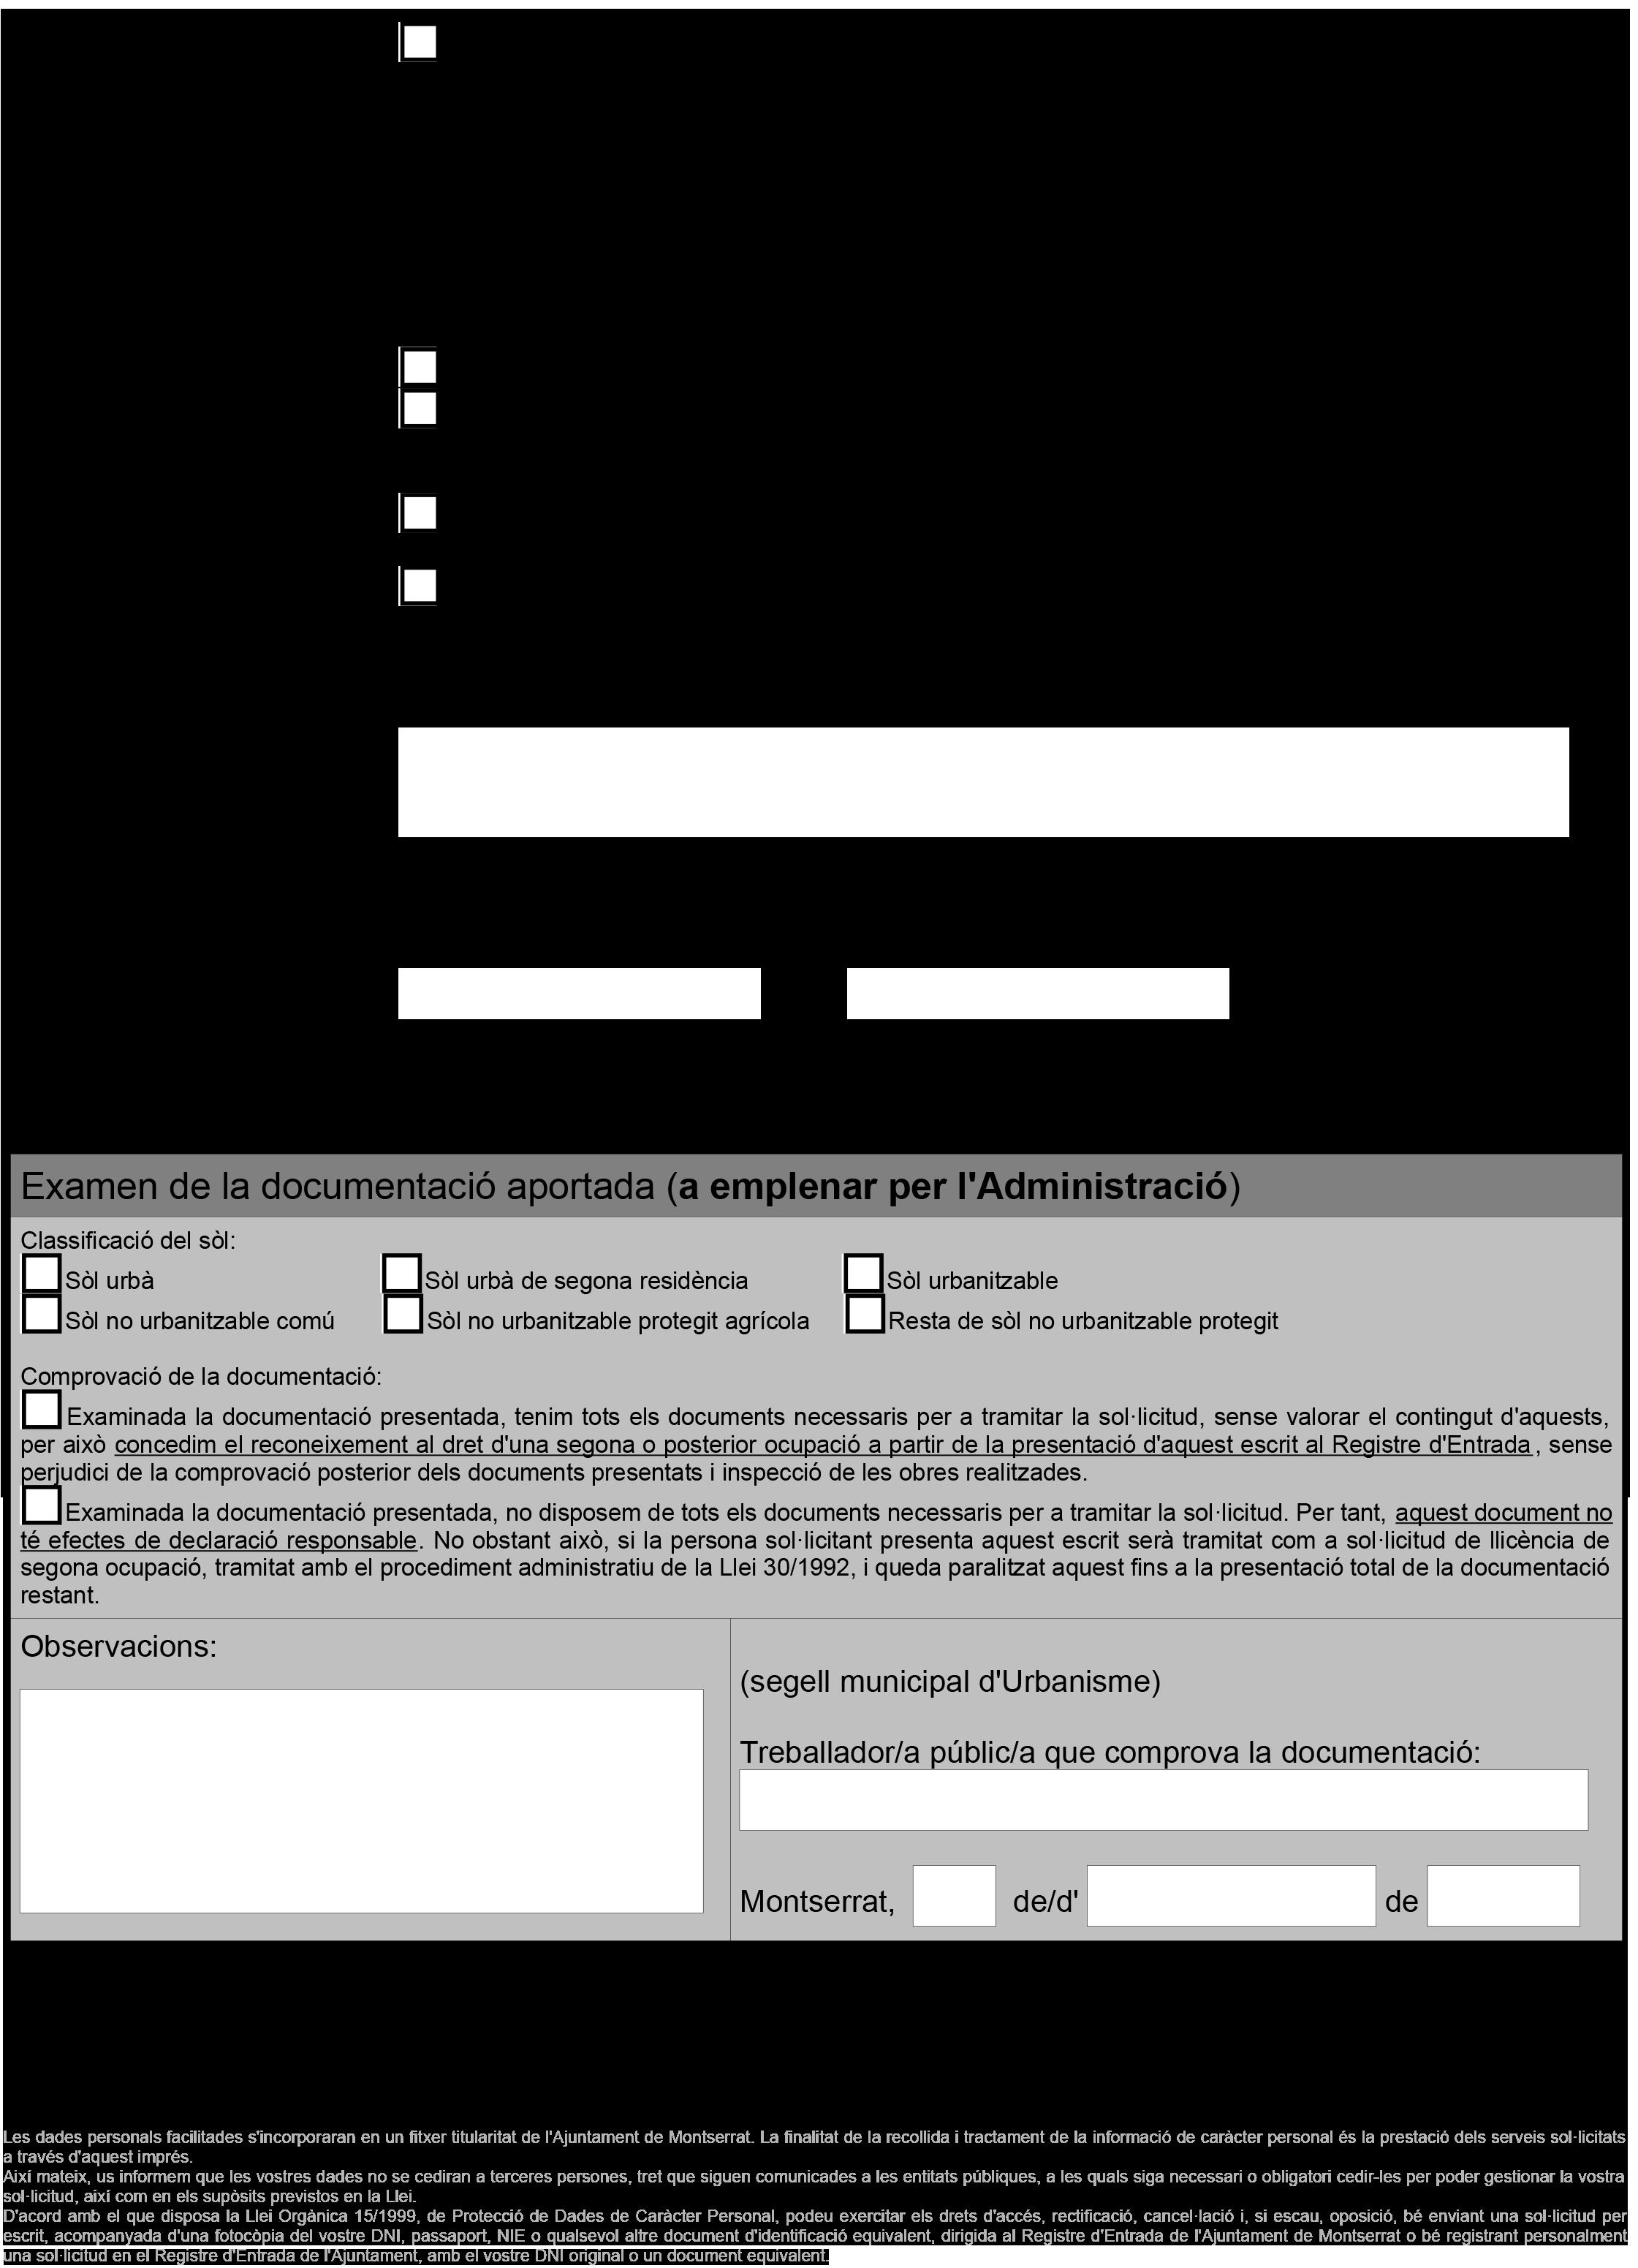 Impreso Declaración Responsable Segunda Ocupación - Montserrat-2 (1)